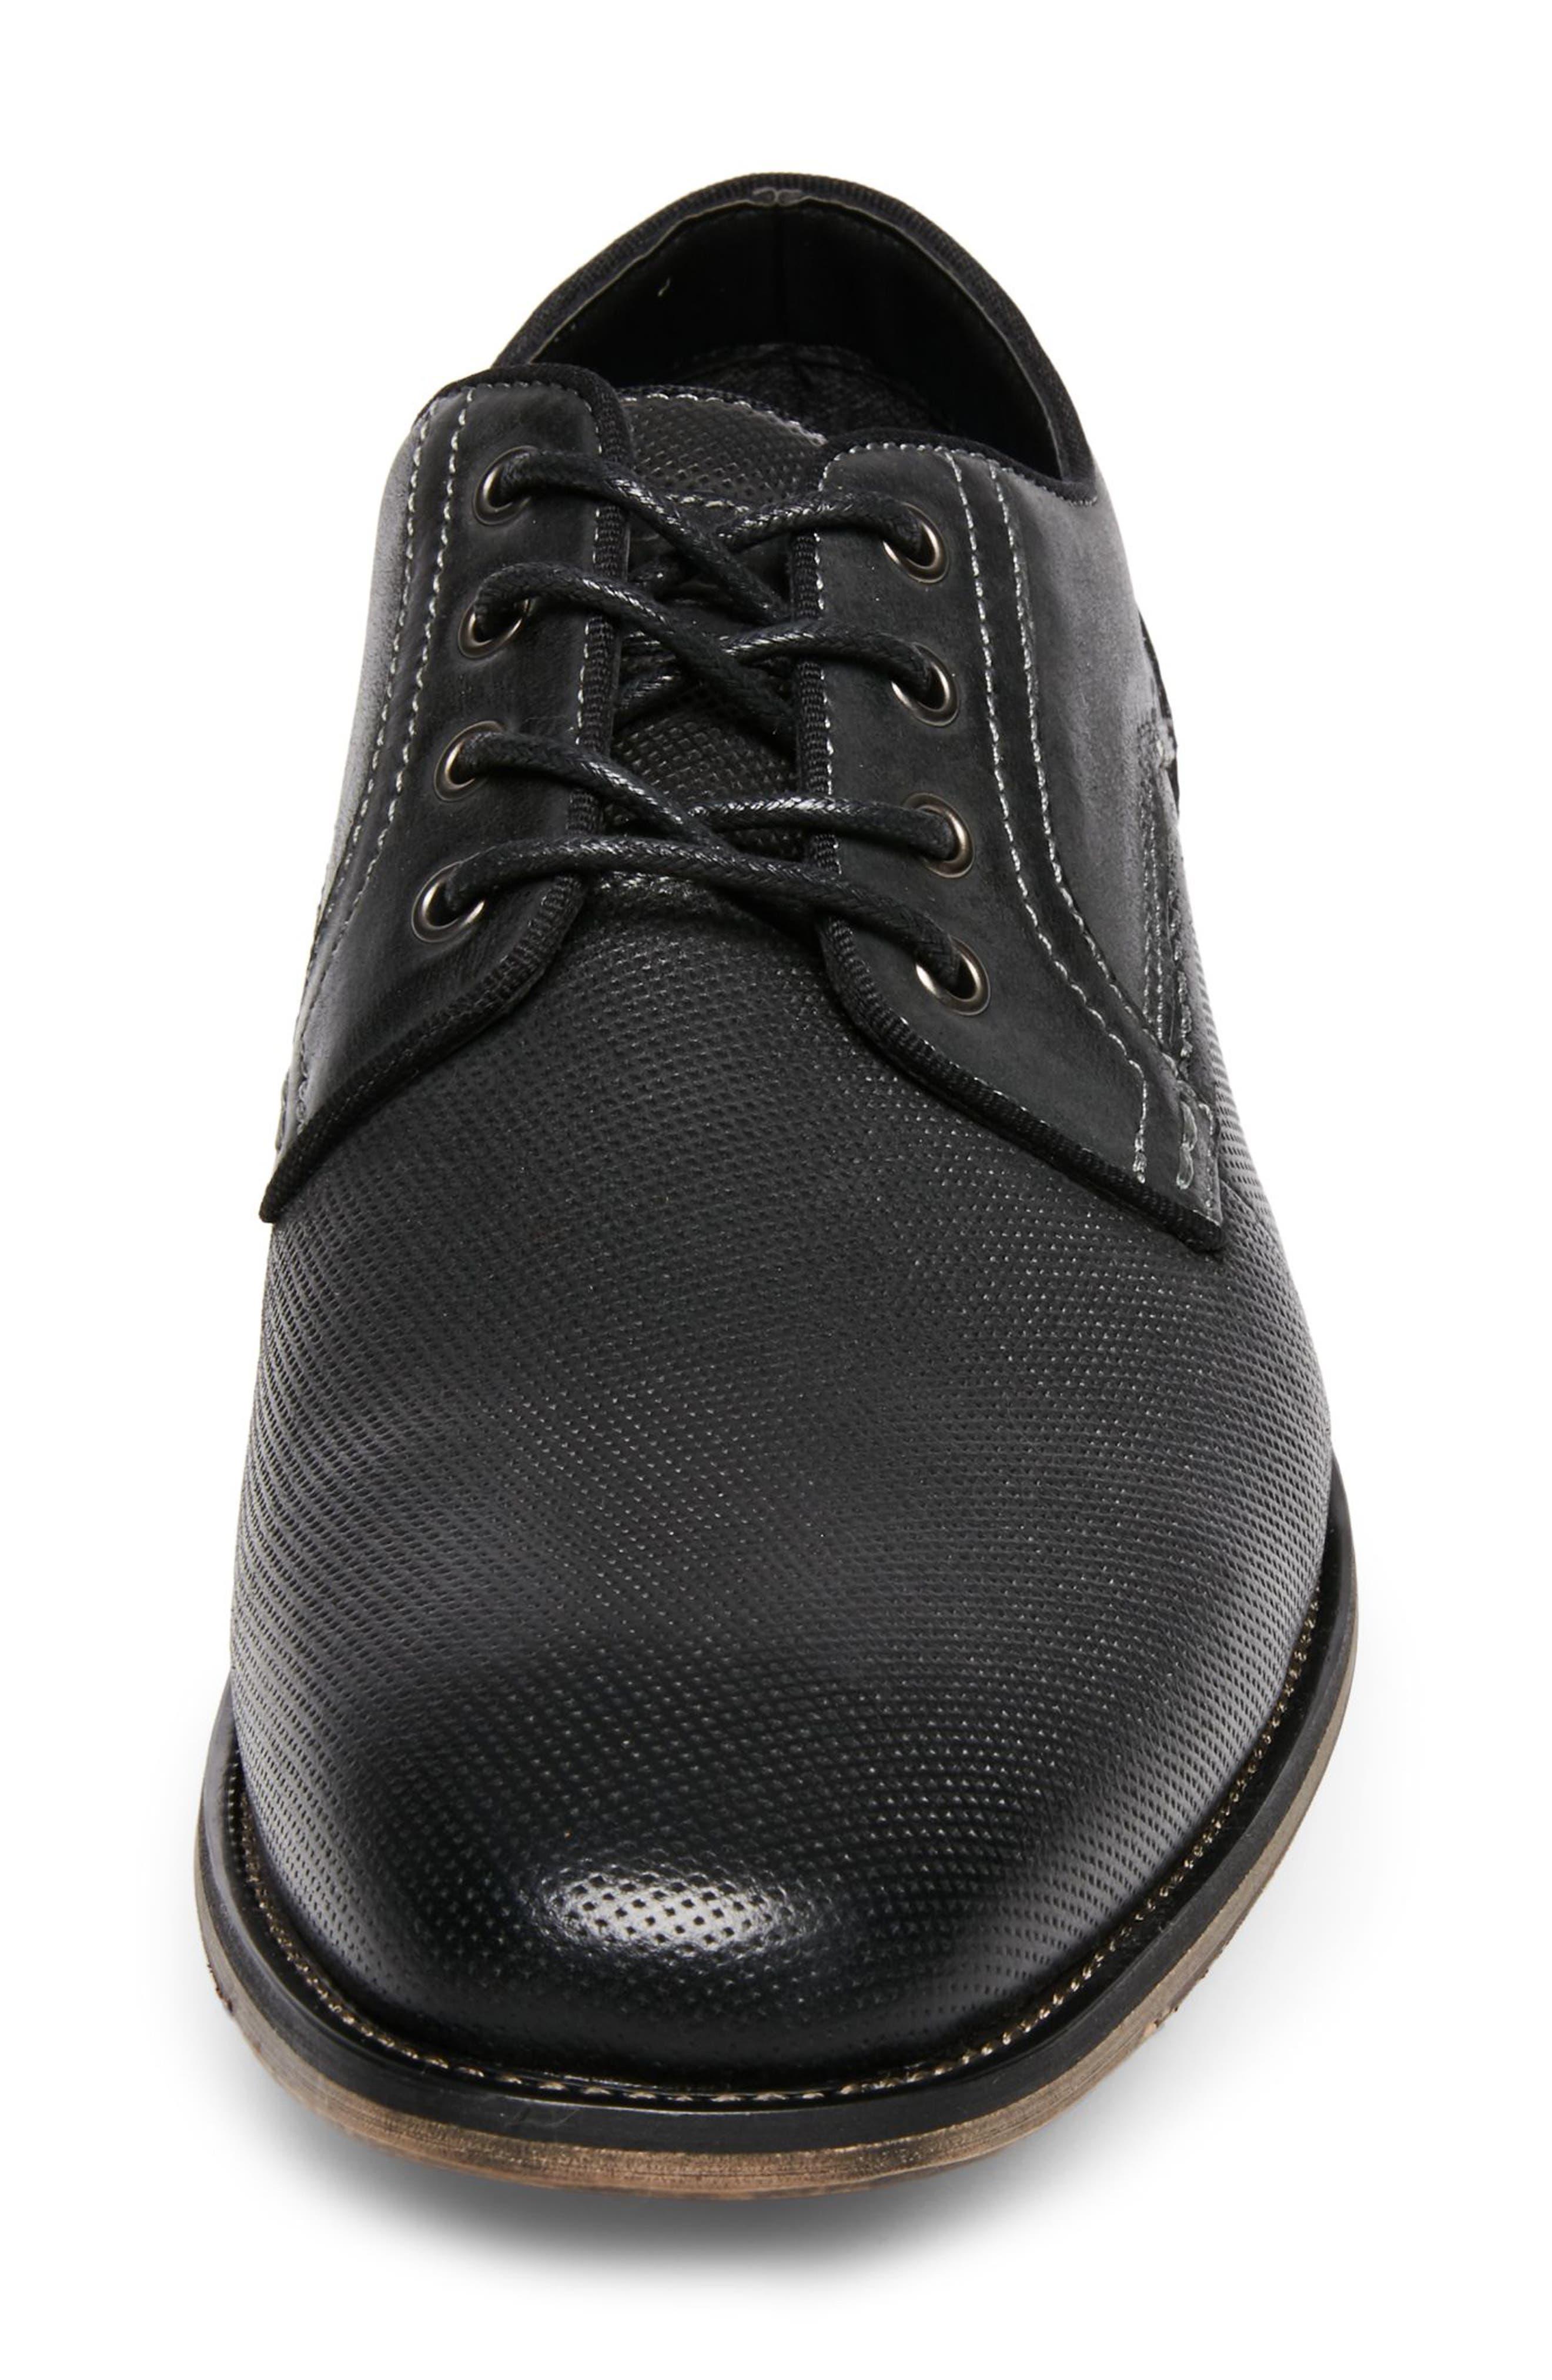 Jaysun Embossed Plain Toe Derby,                             Alternate thumbnail 4, color,                             Dark Grey Leather